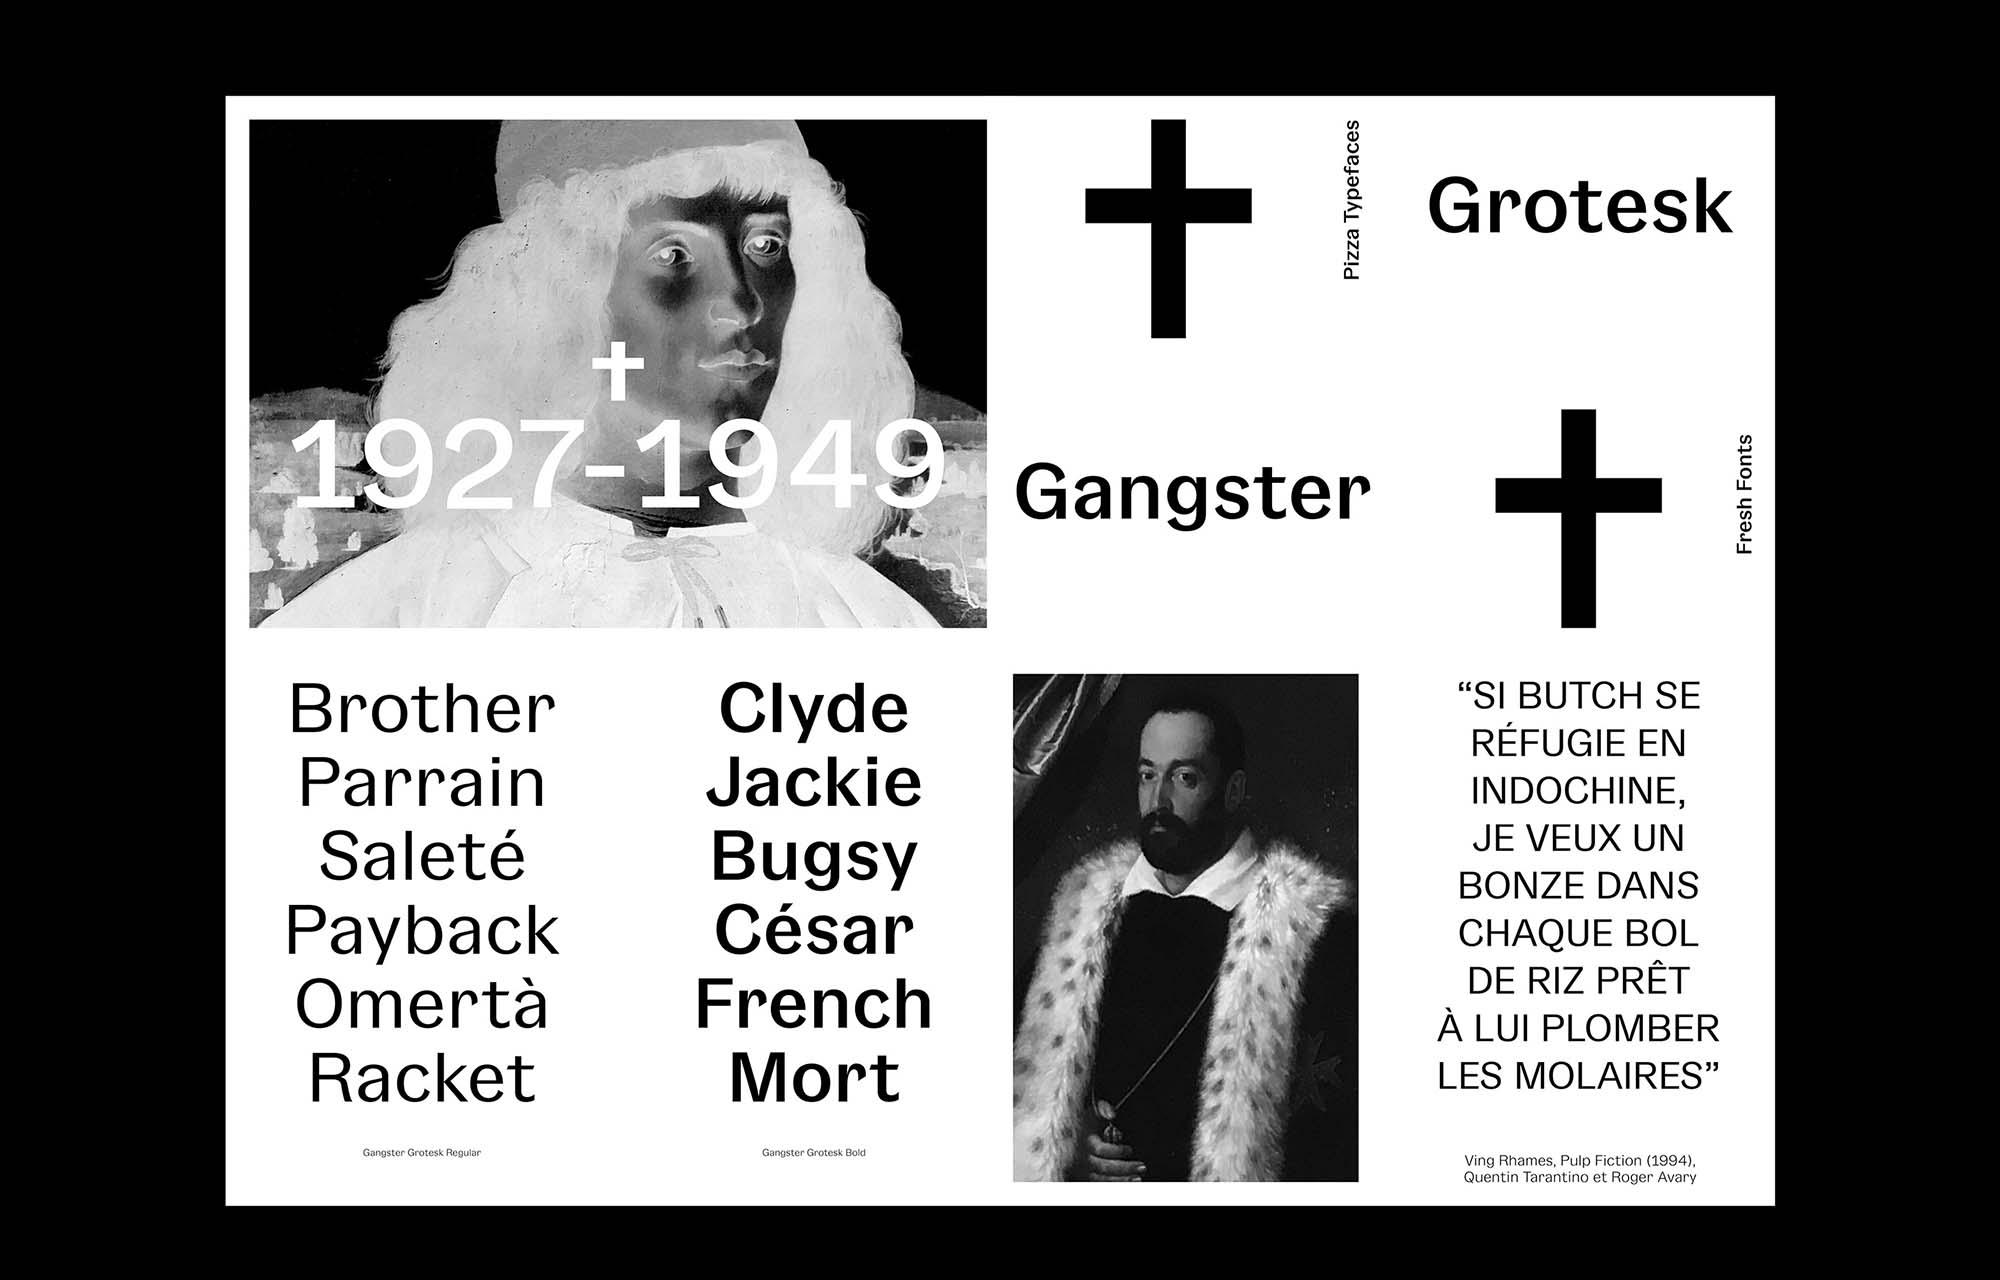 Gangster Grotesk Typeface 1